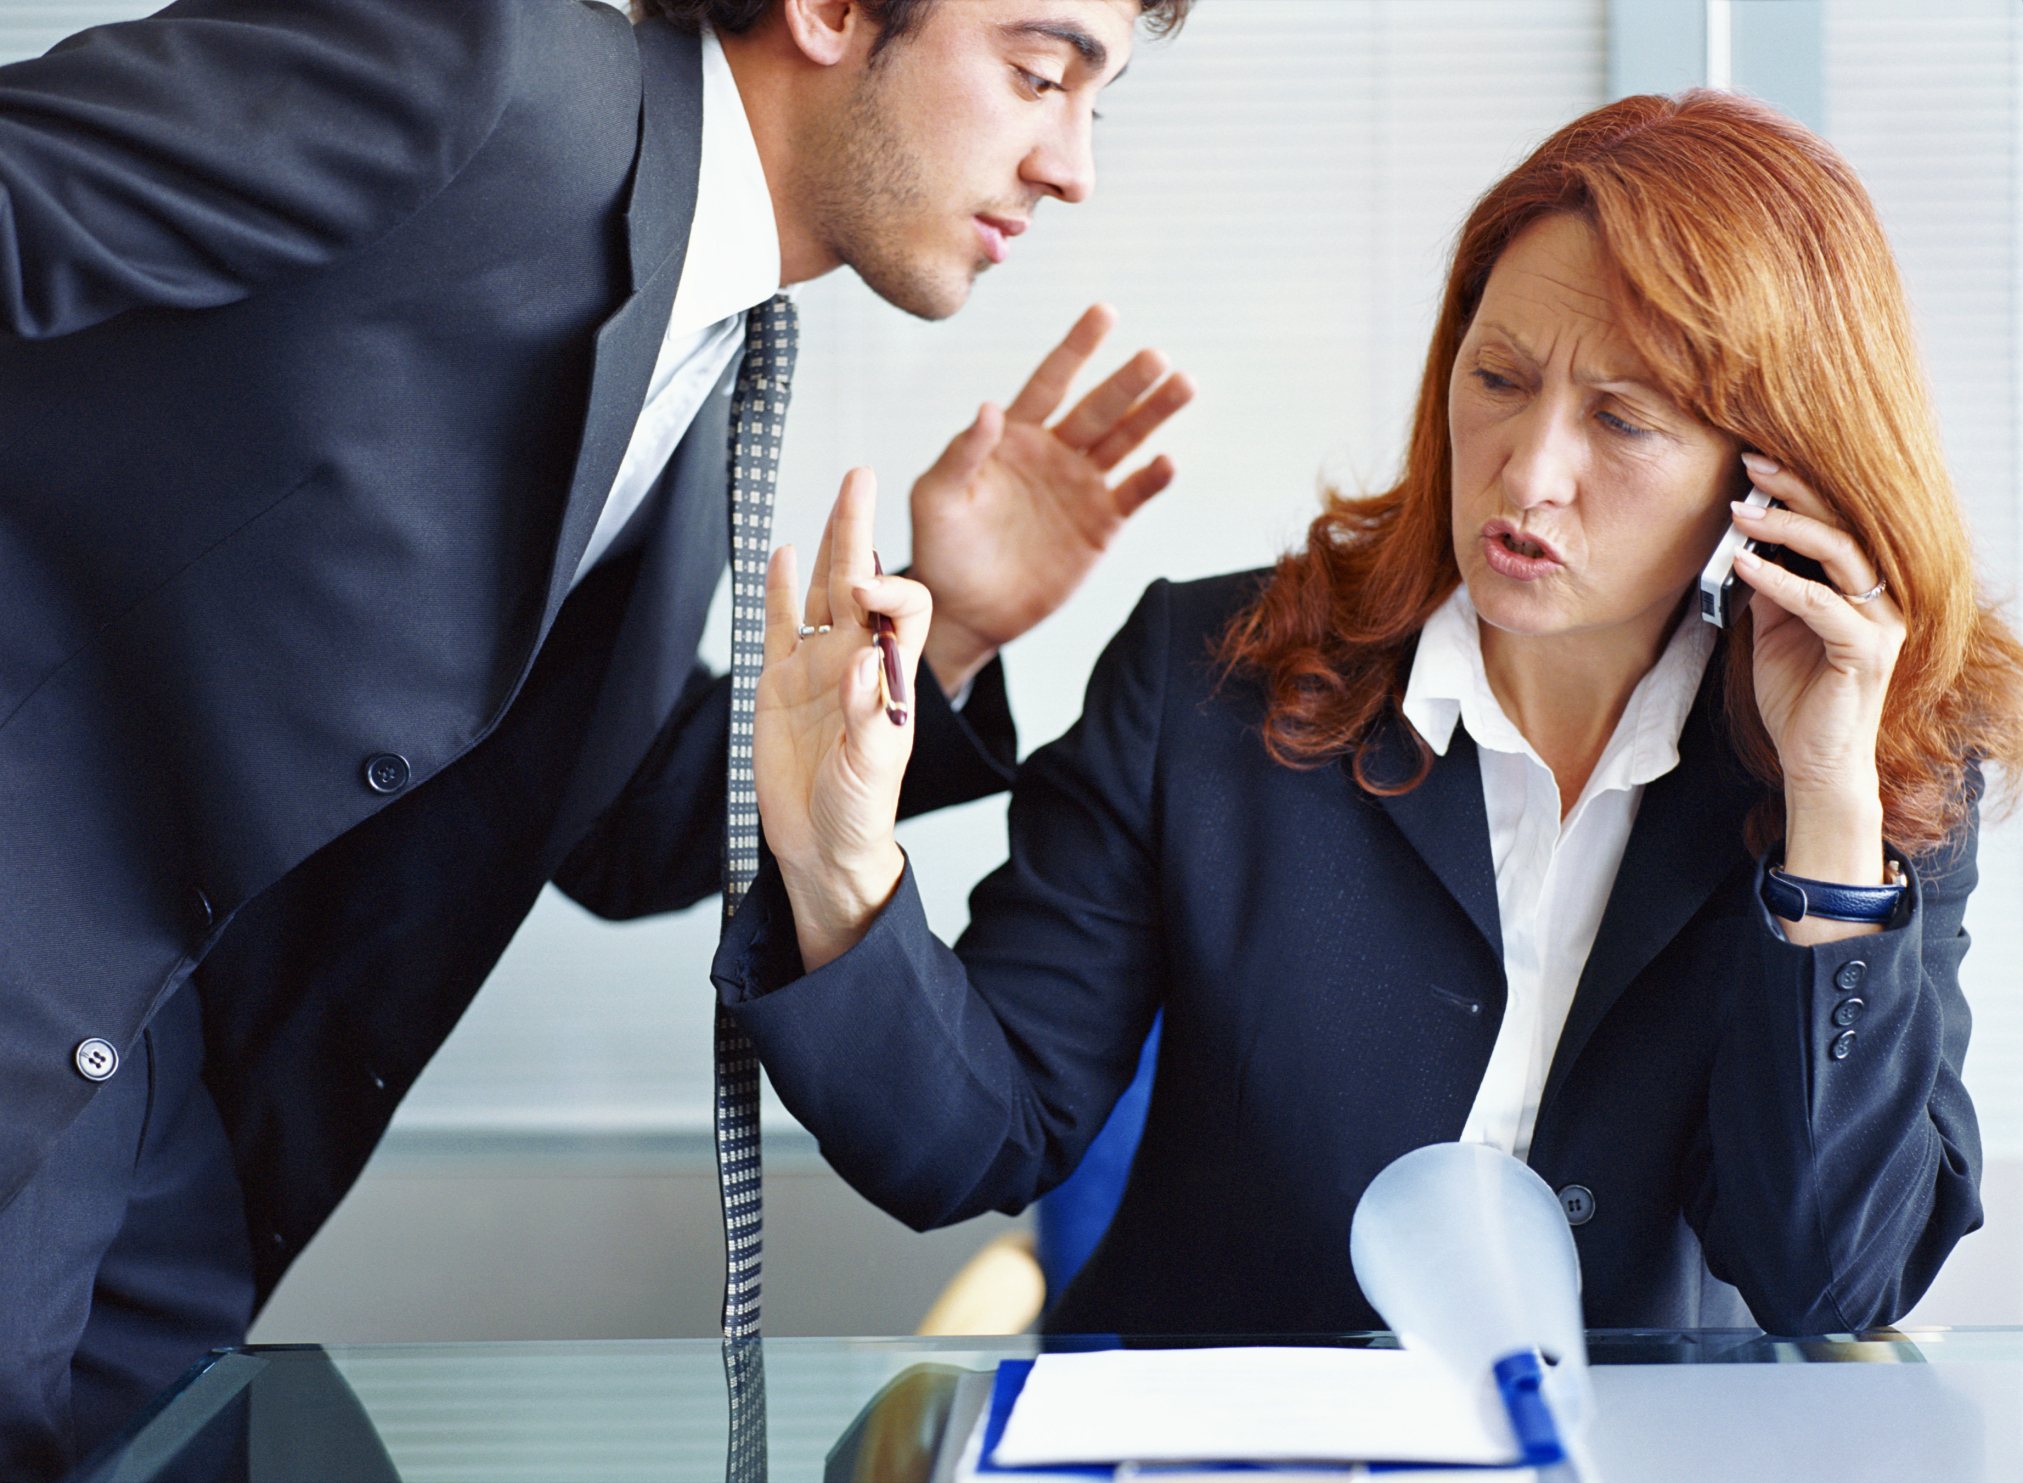 managing communication at work